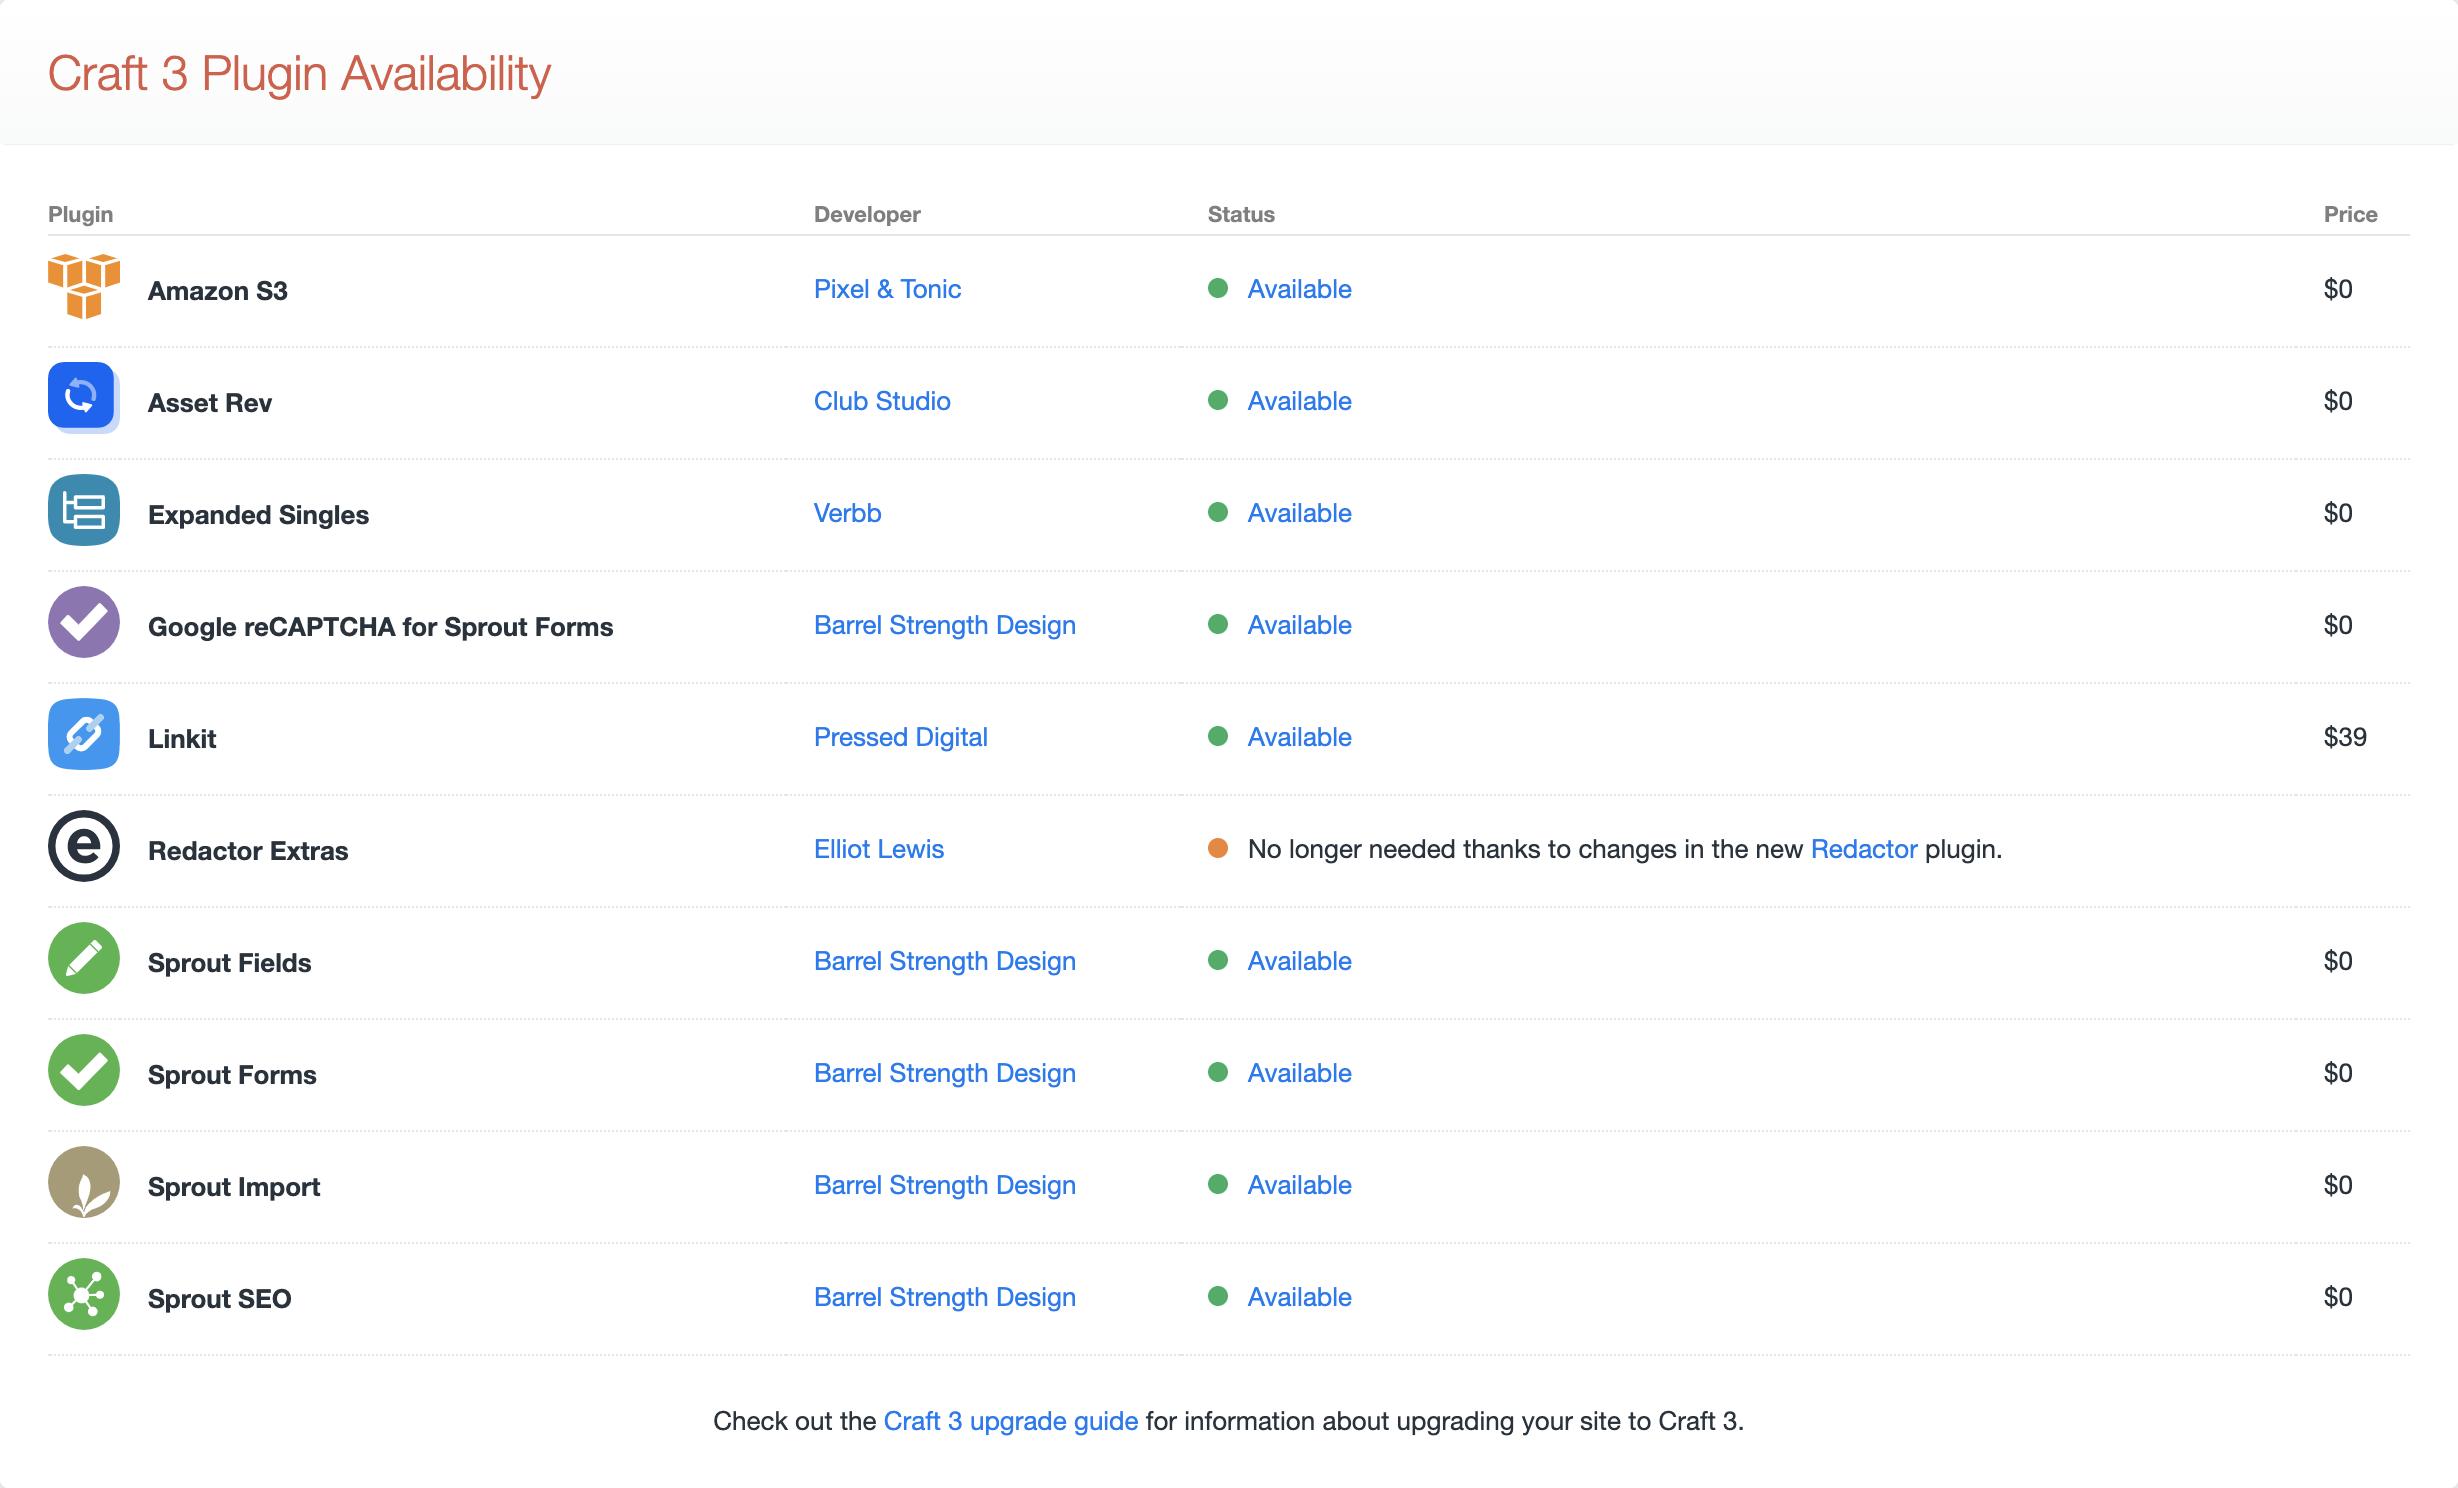 Craft 3 Plugin Availability